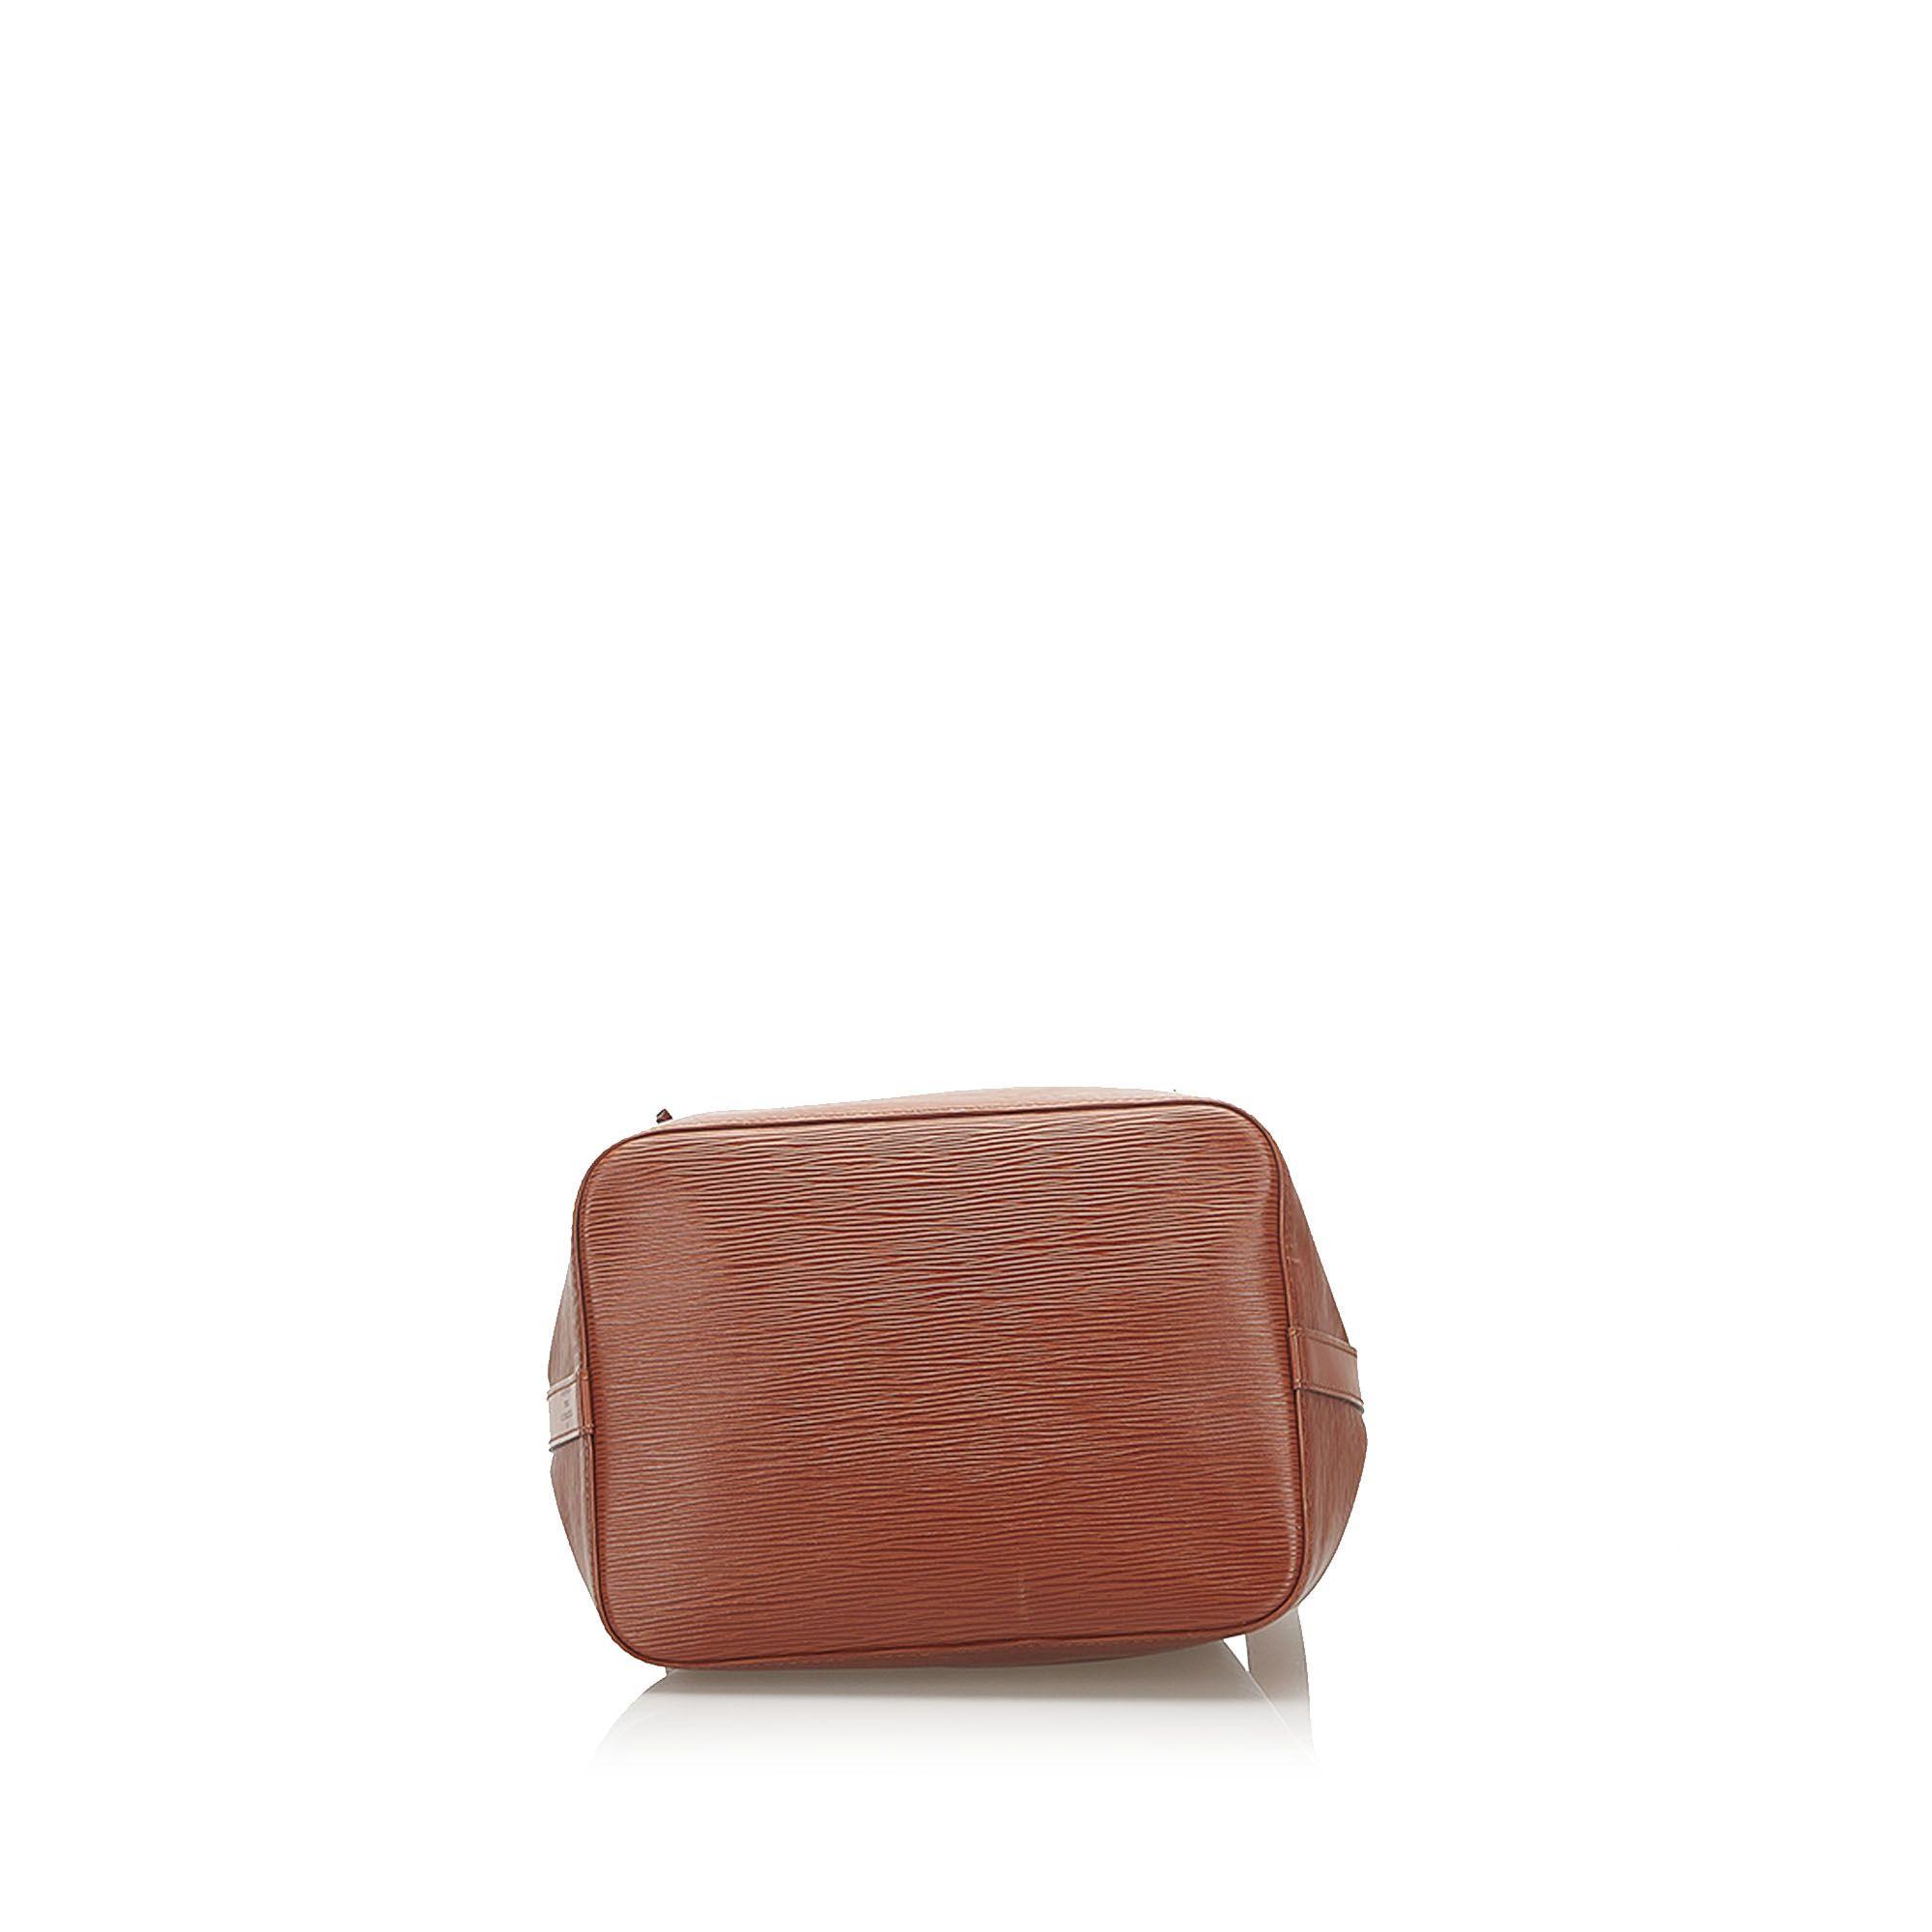 Vintage Louis Vuitton Epi Petit Noe Brown